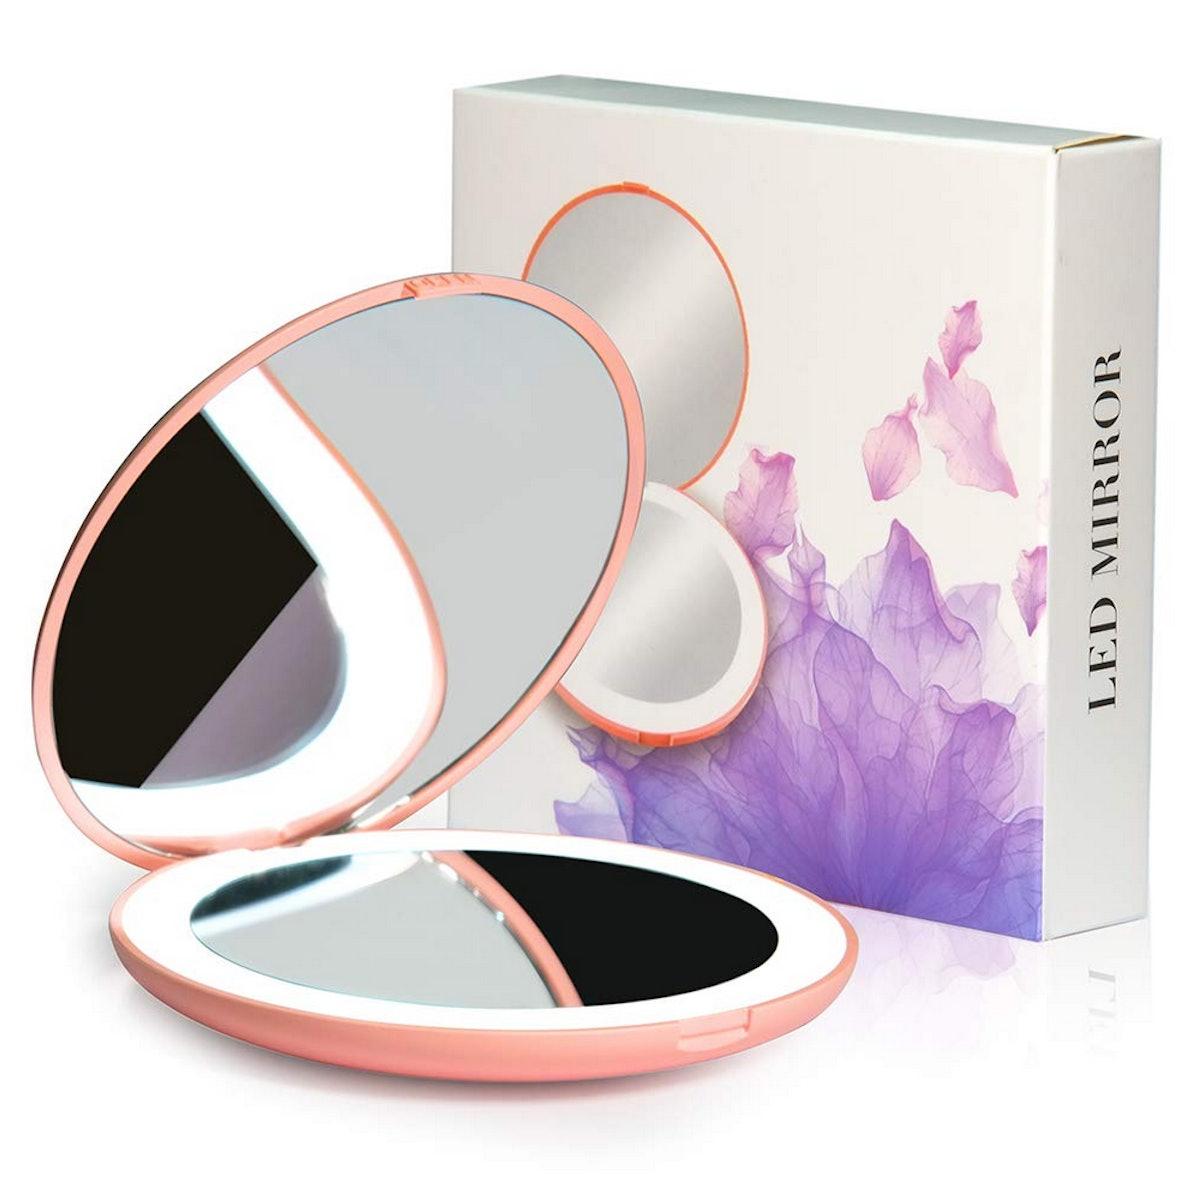 WOBANE LED Travel Compact Mirror